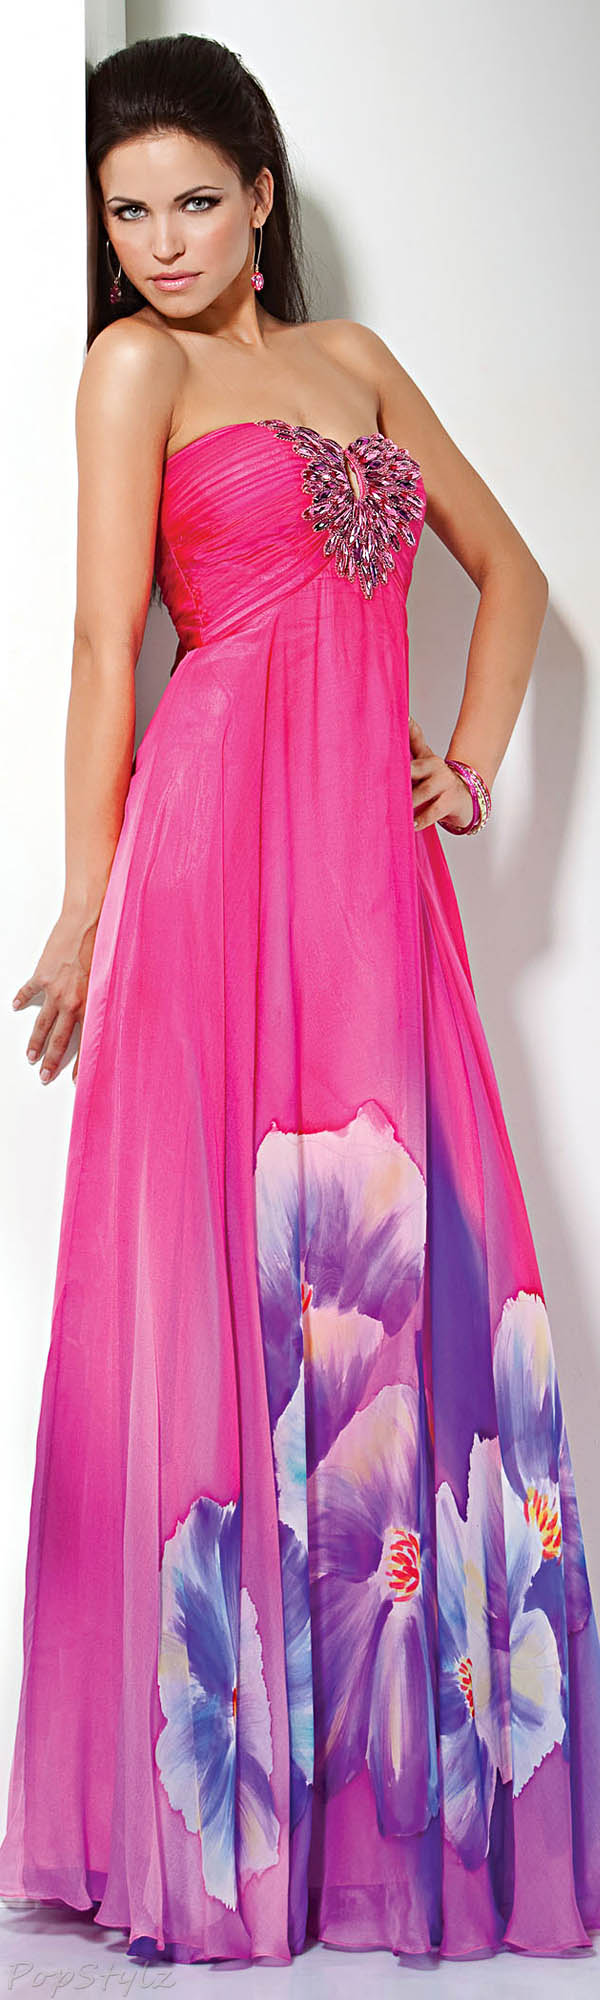 Jovani 158840 Evening Gown | Just pretty | Pinterest | Vestidos de ...